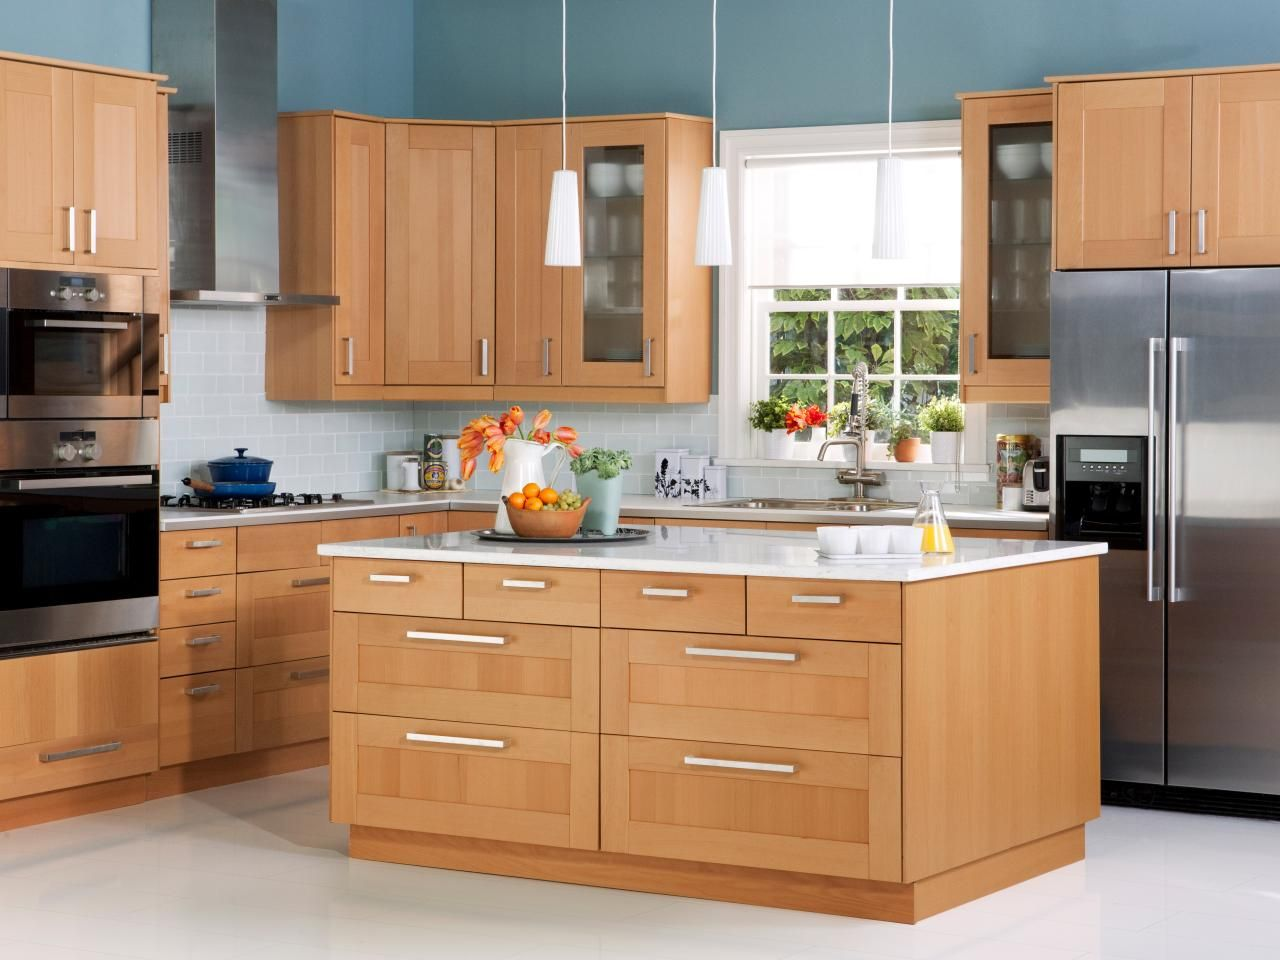 estimate for kitchen cabinets paula deen ikea cost jpeg fantastic